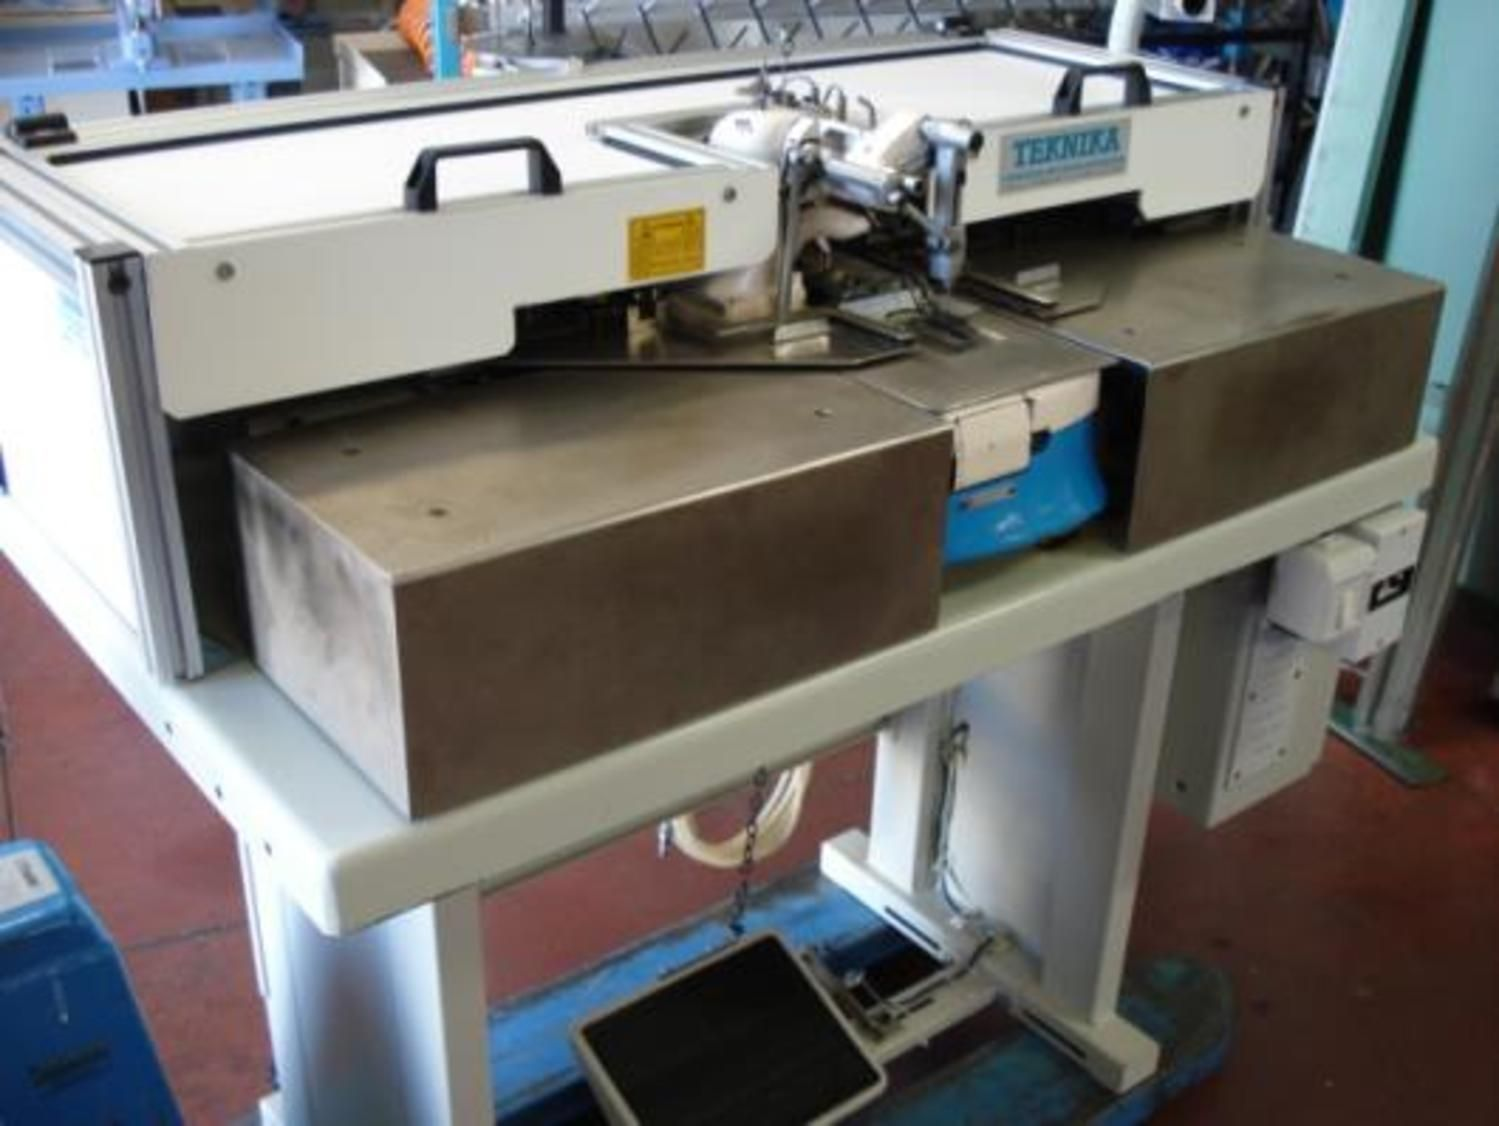 Nähmaschine Tecnica C016